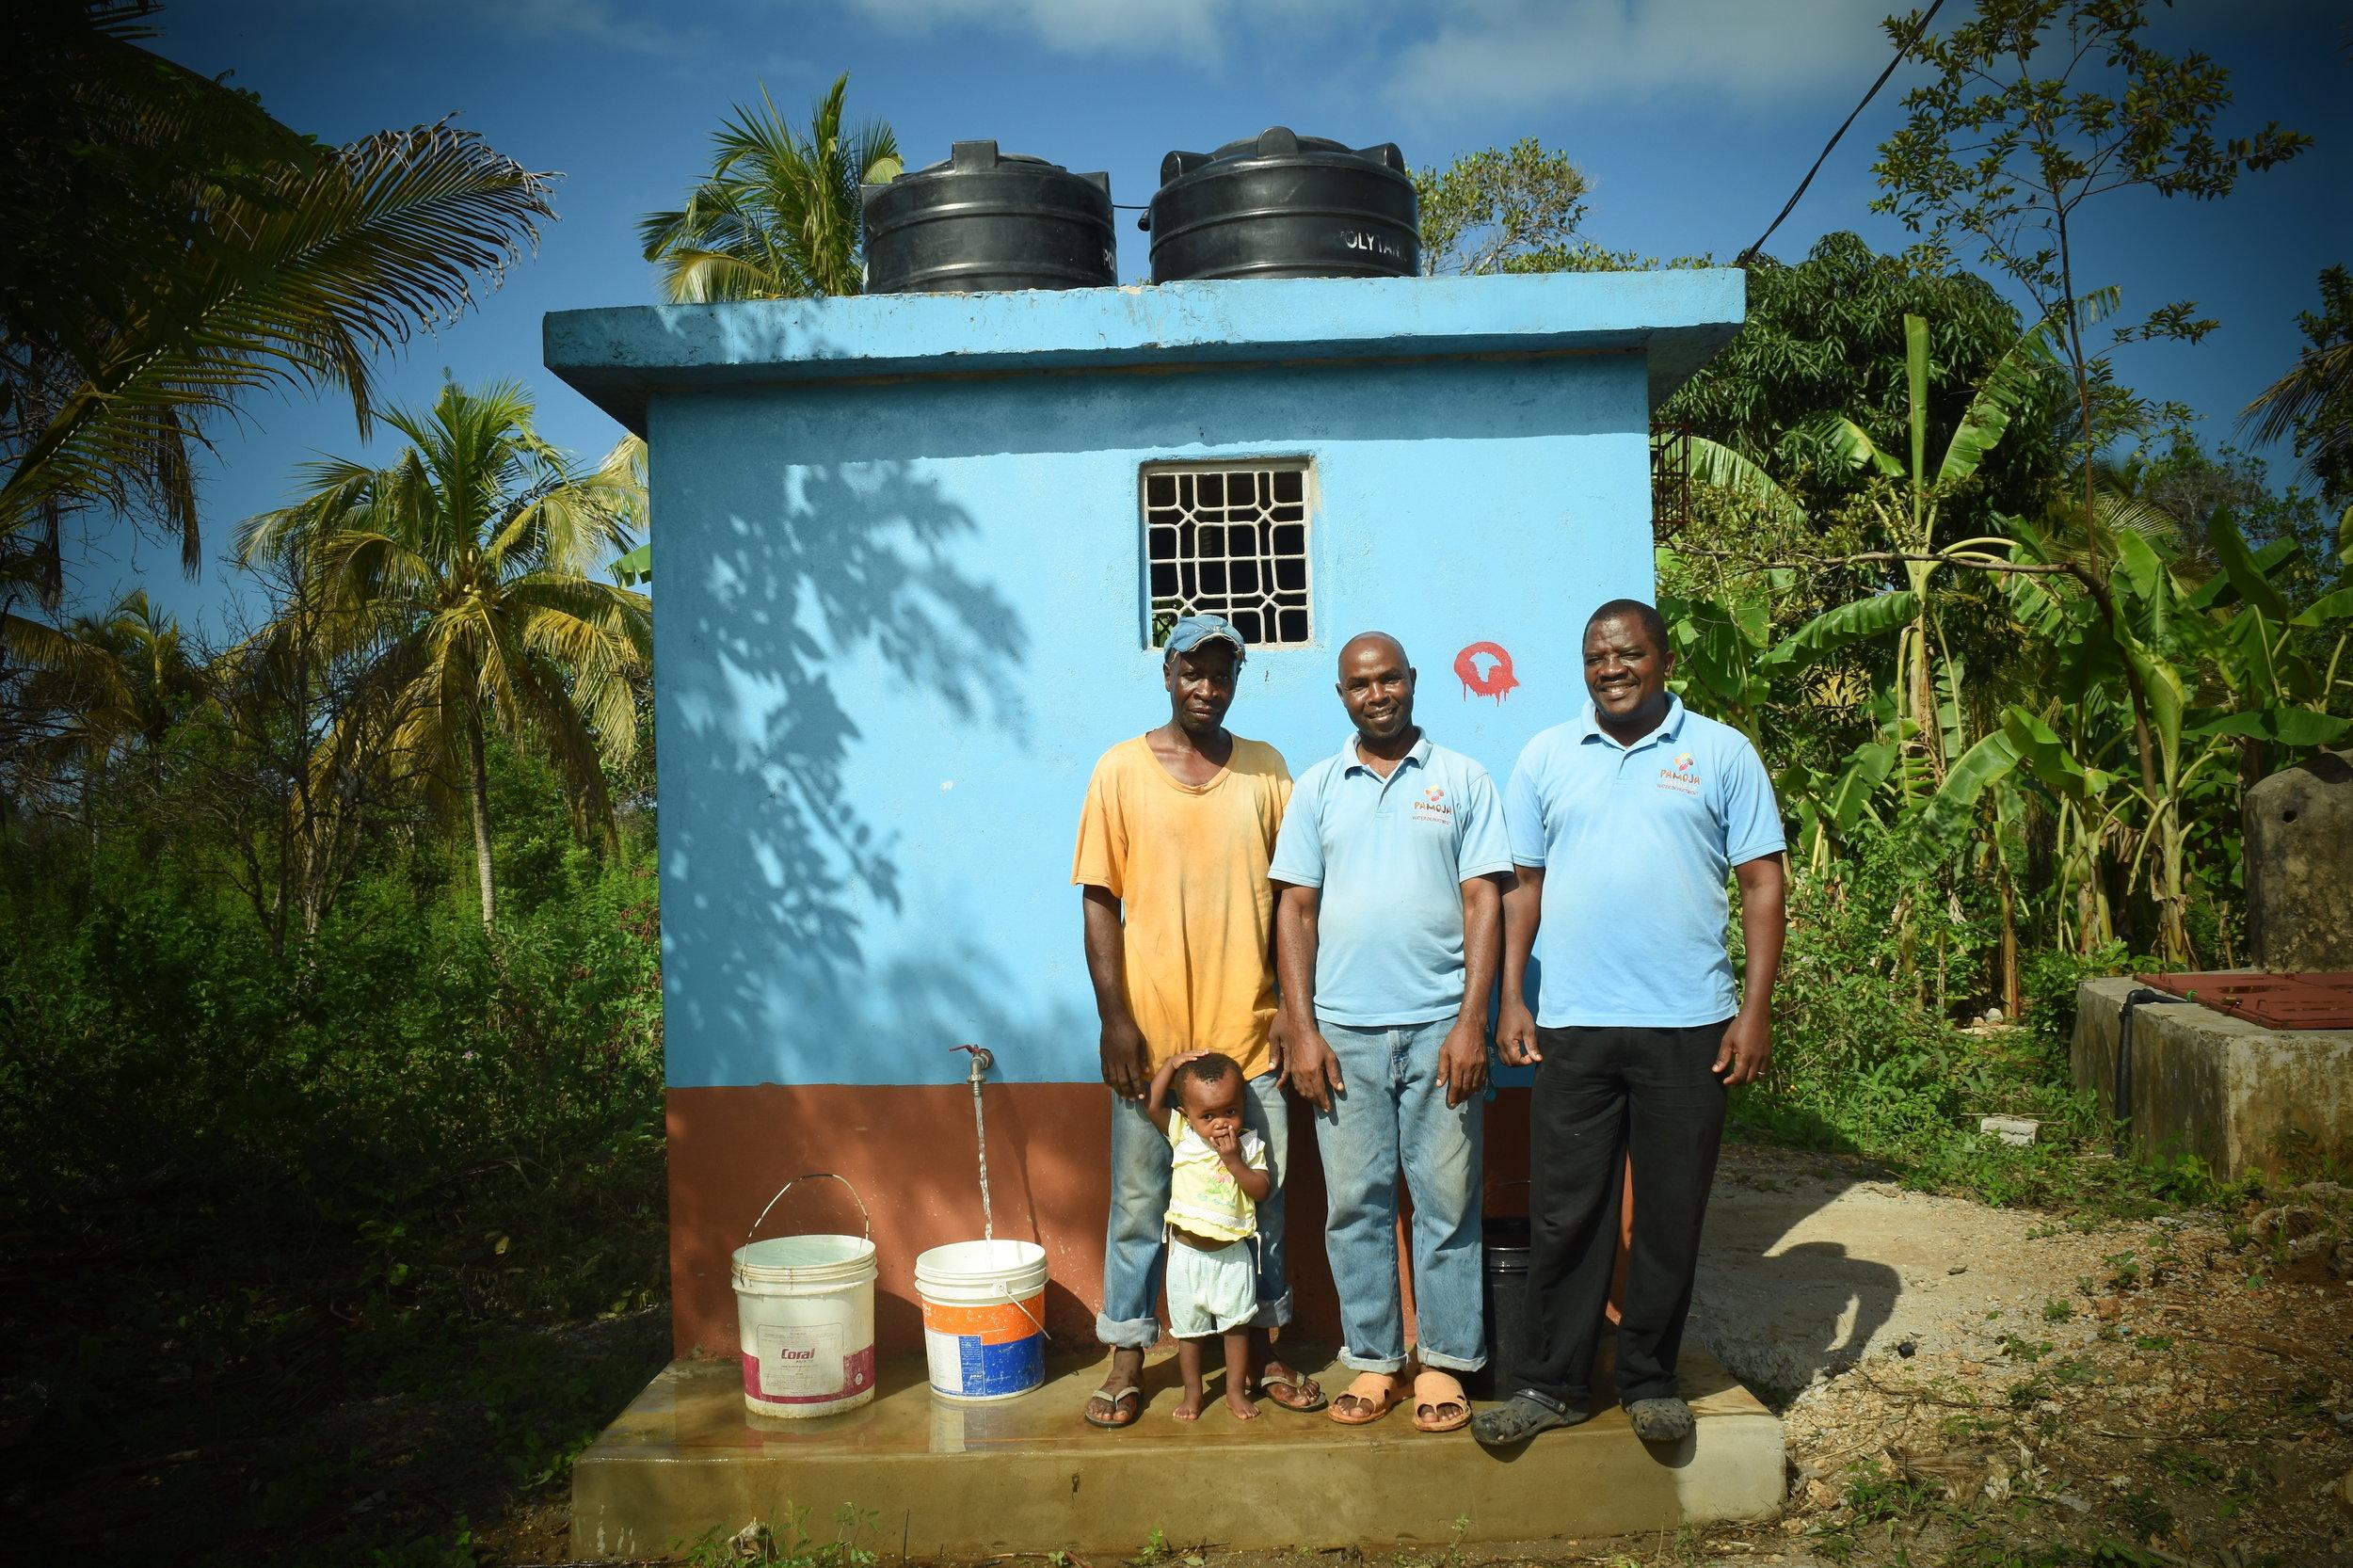 The local operators of Buju's water plant